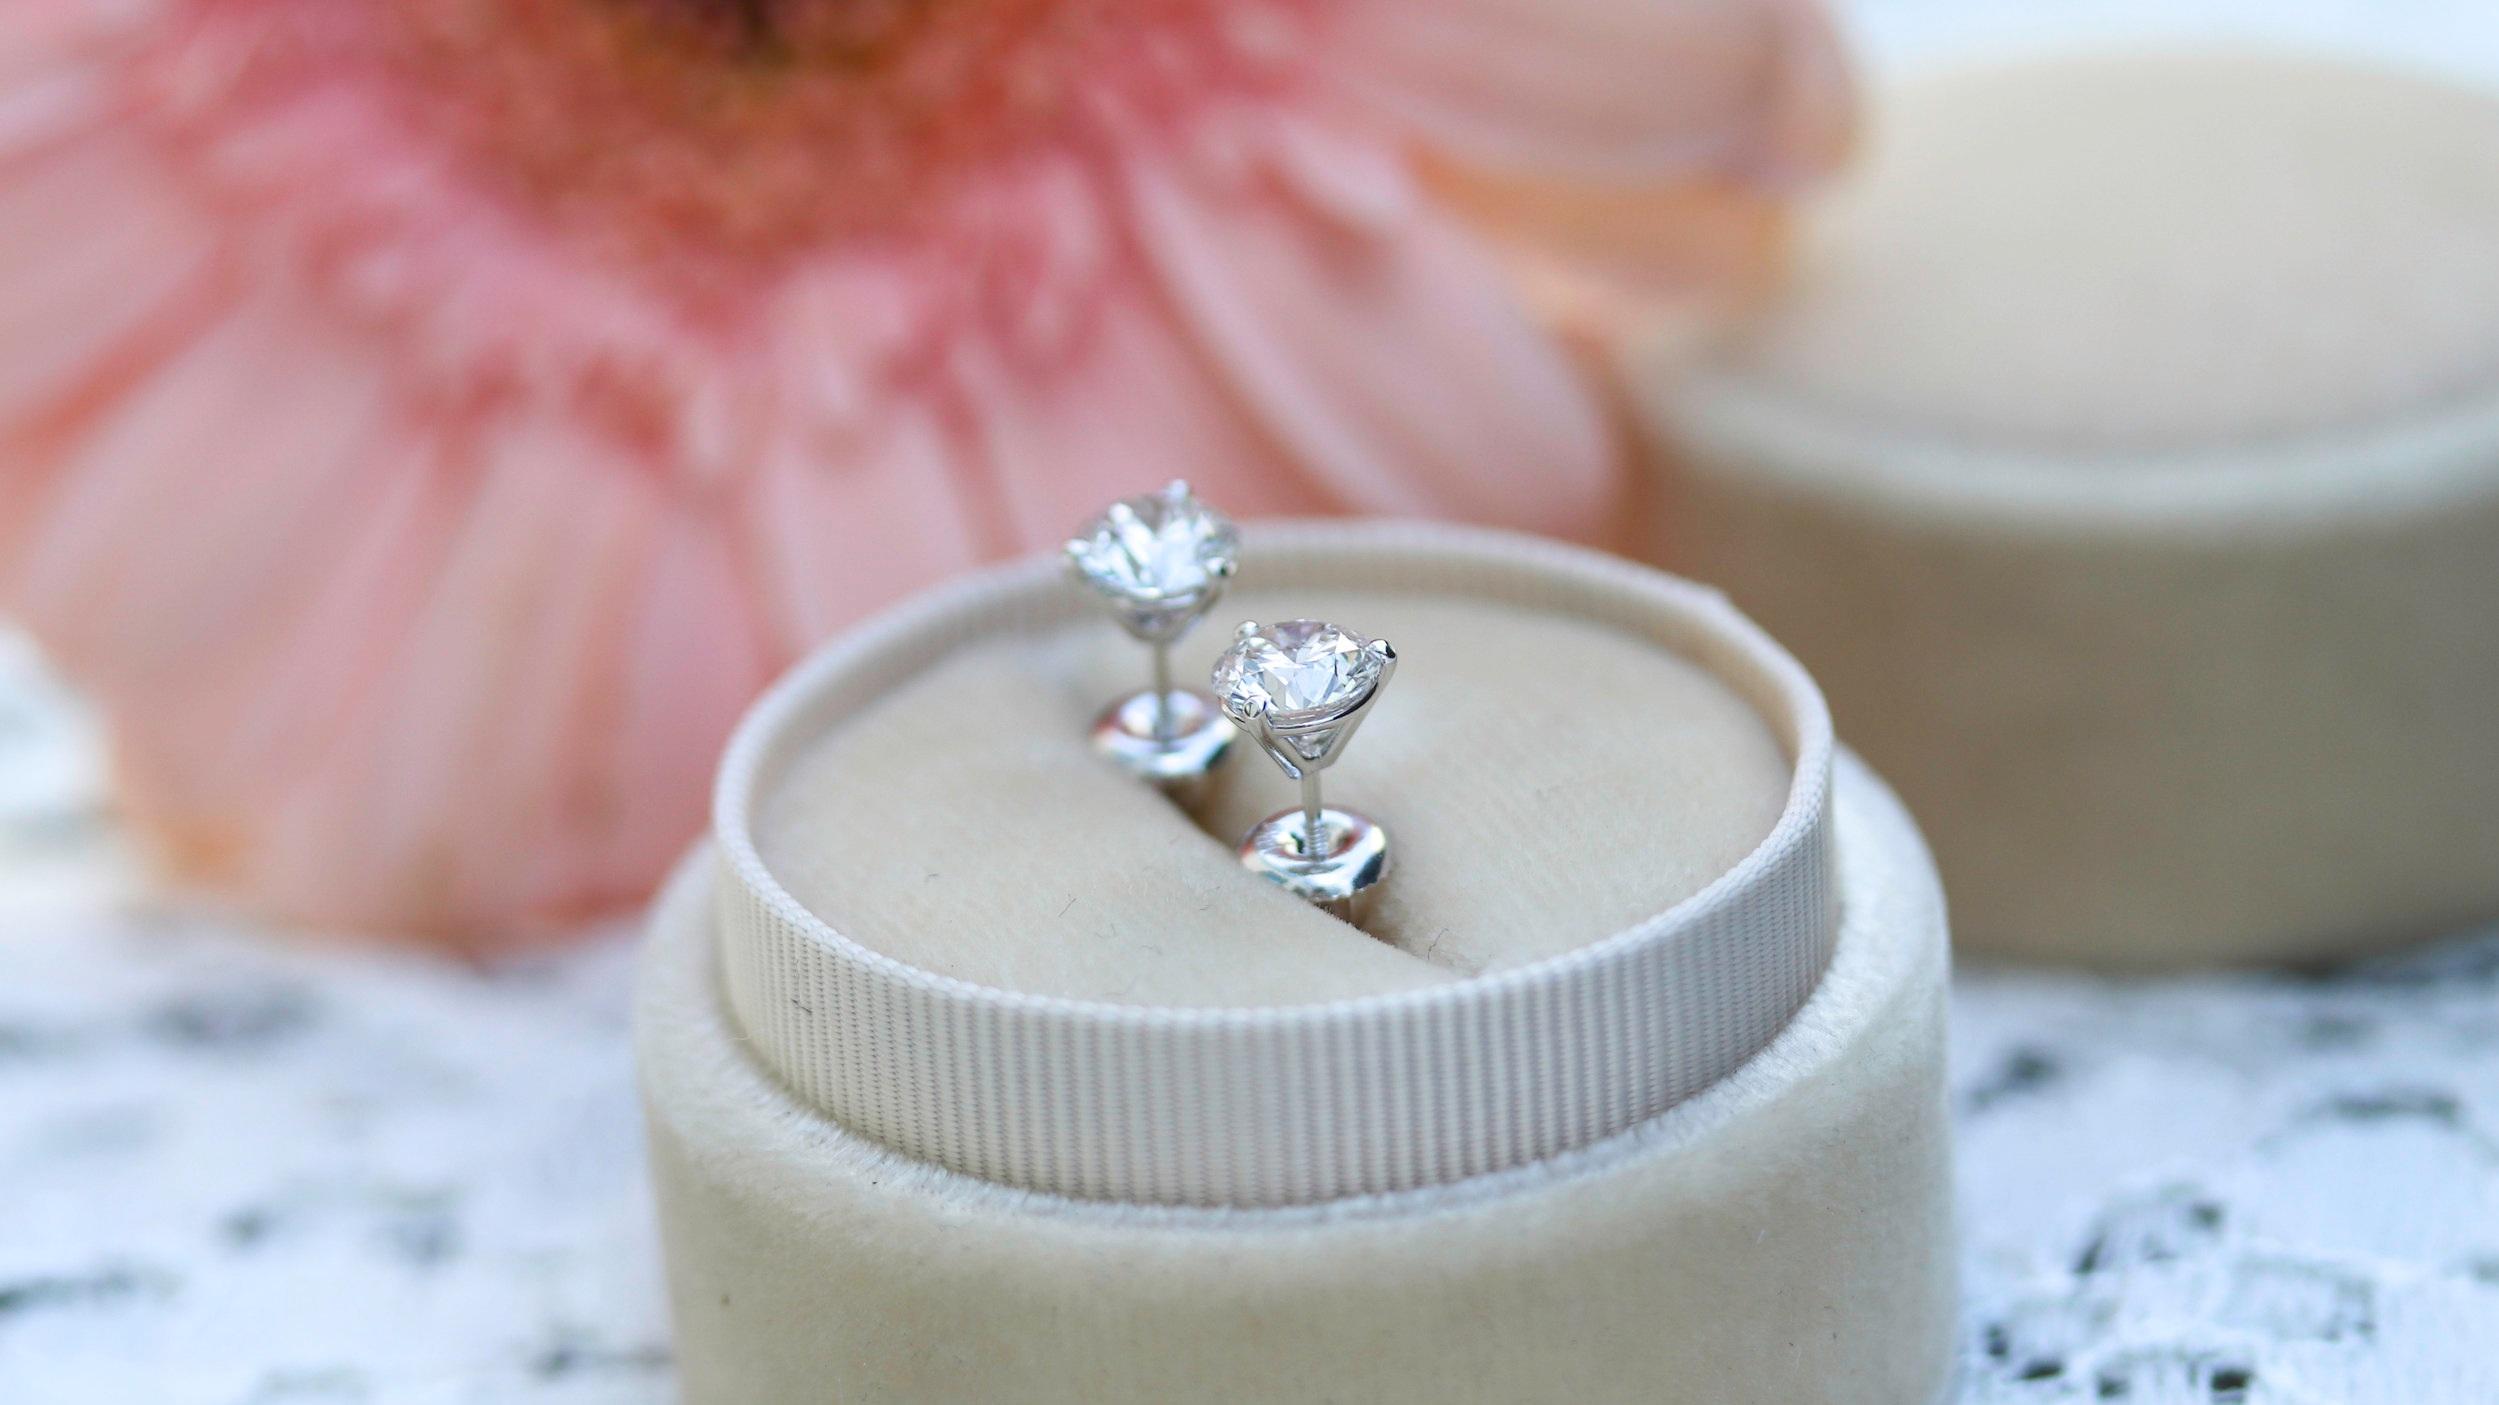 Lab Diamond Emerald Cut Halo Stud Earrings in White Gold AD-196